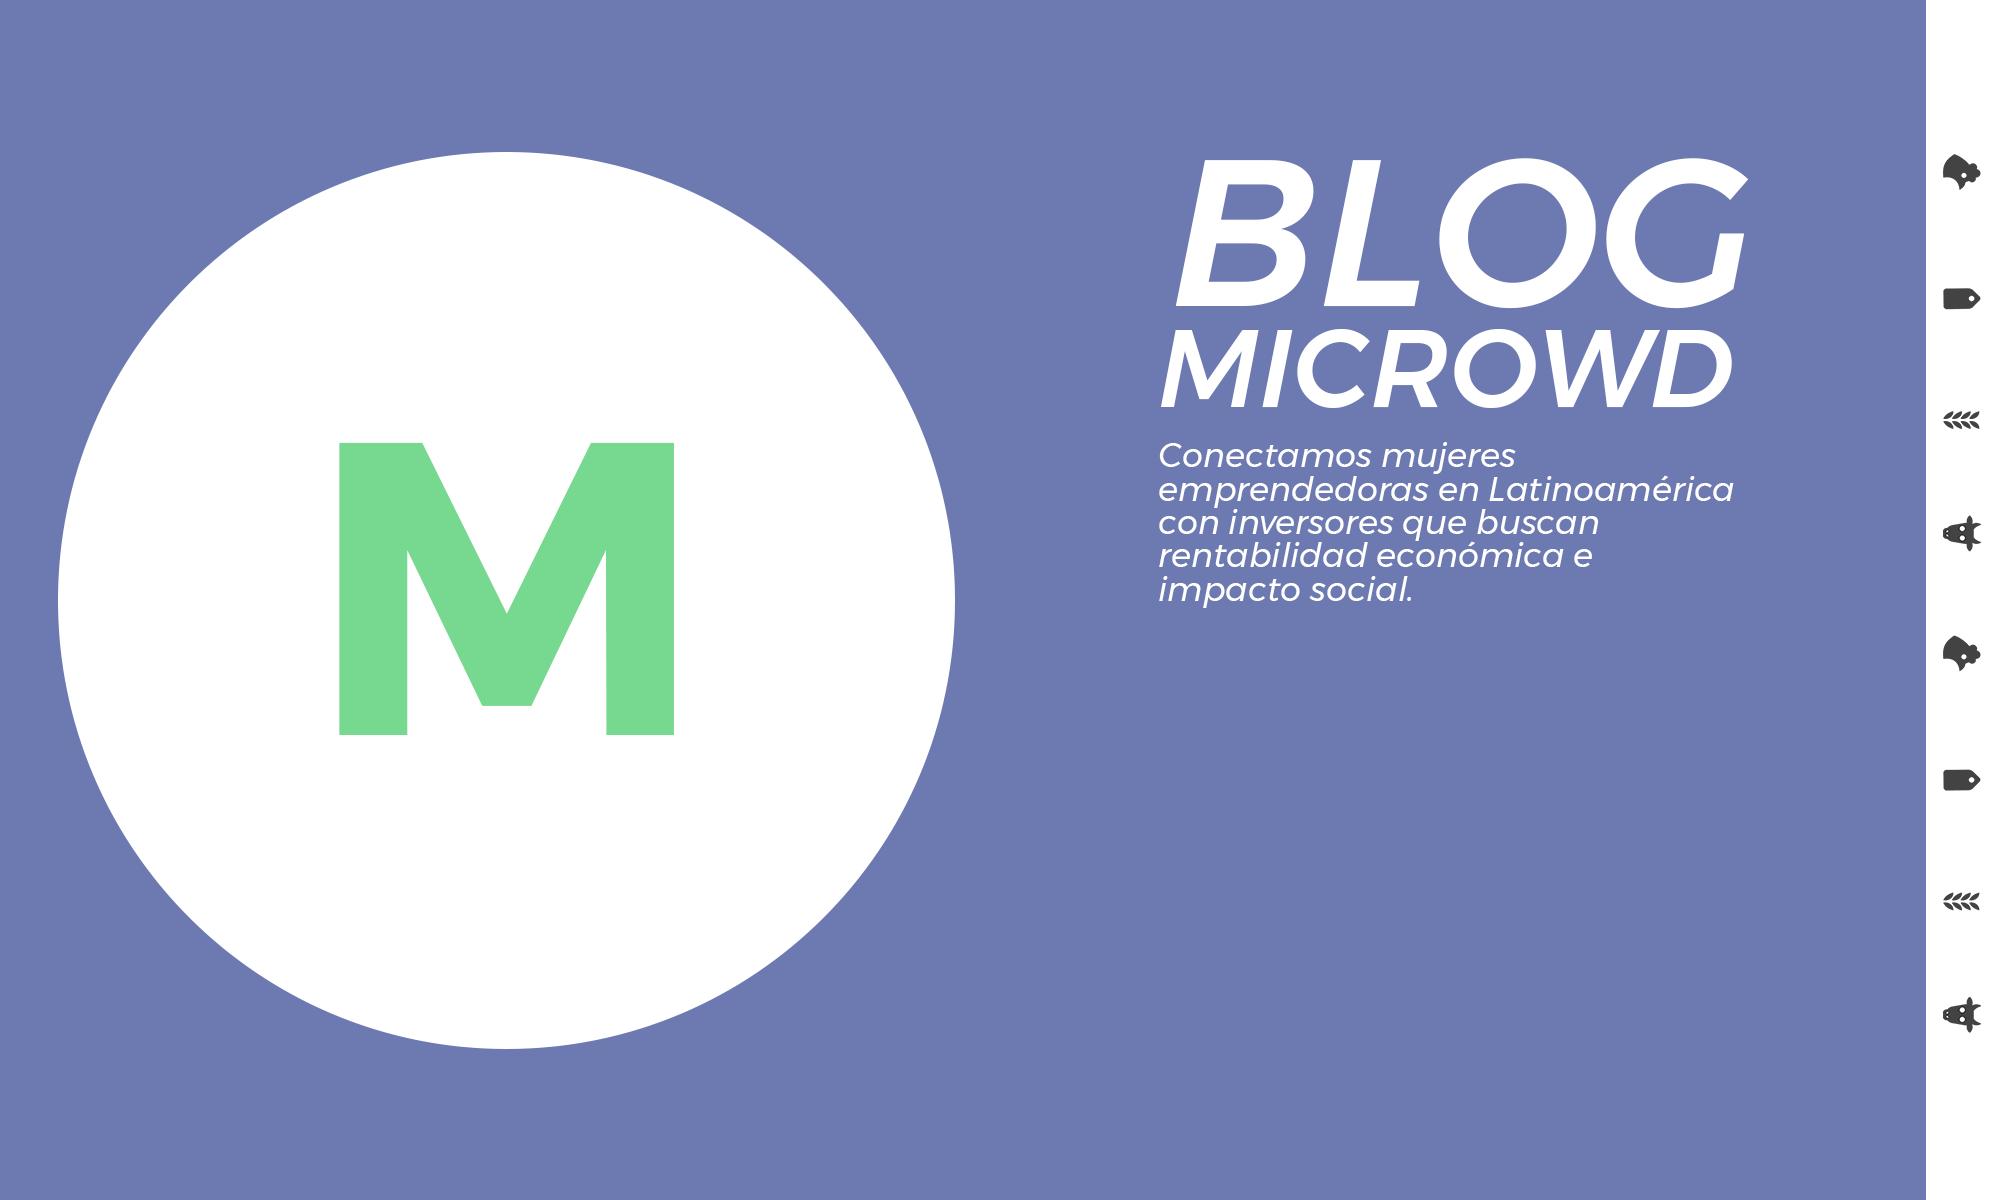 Blog Microwd